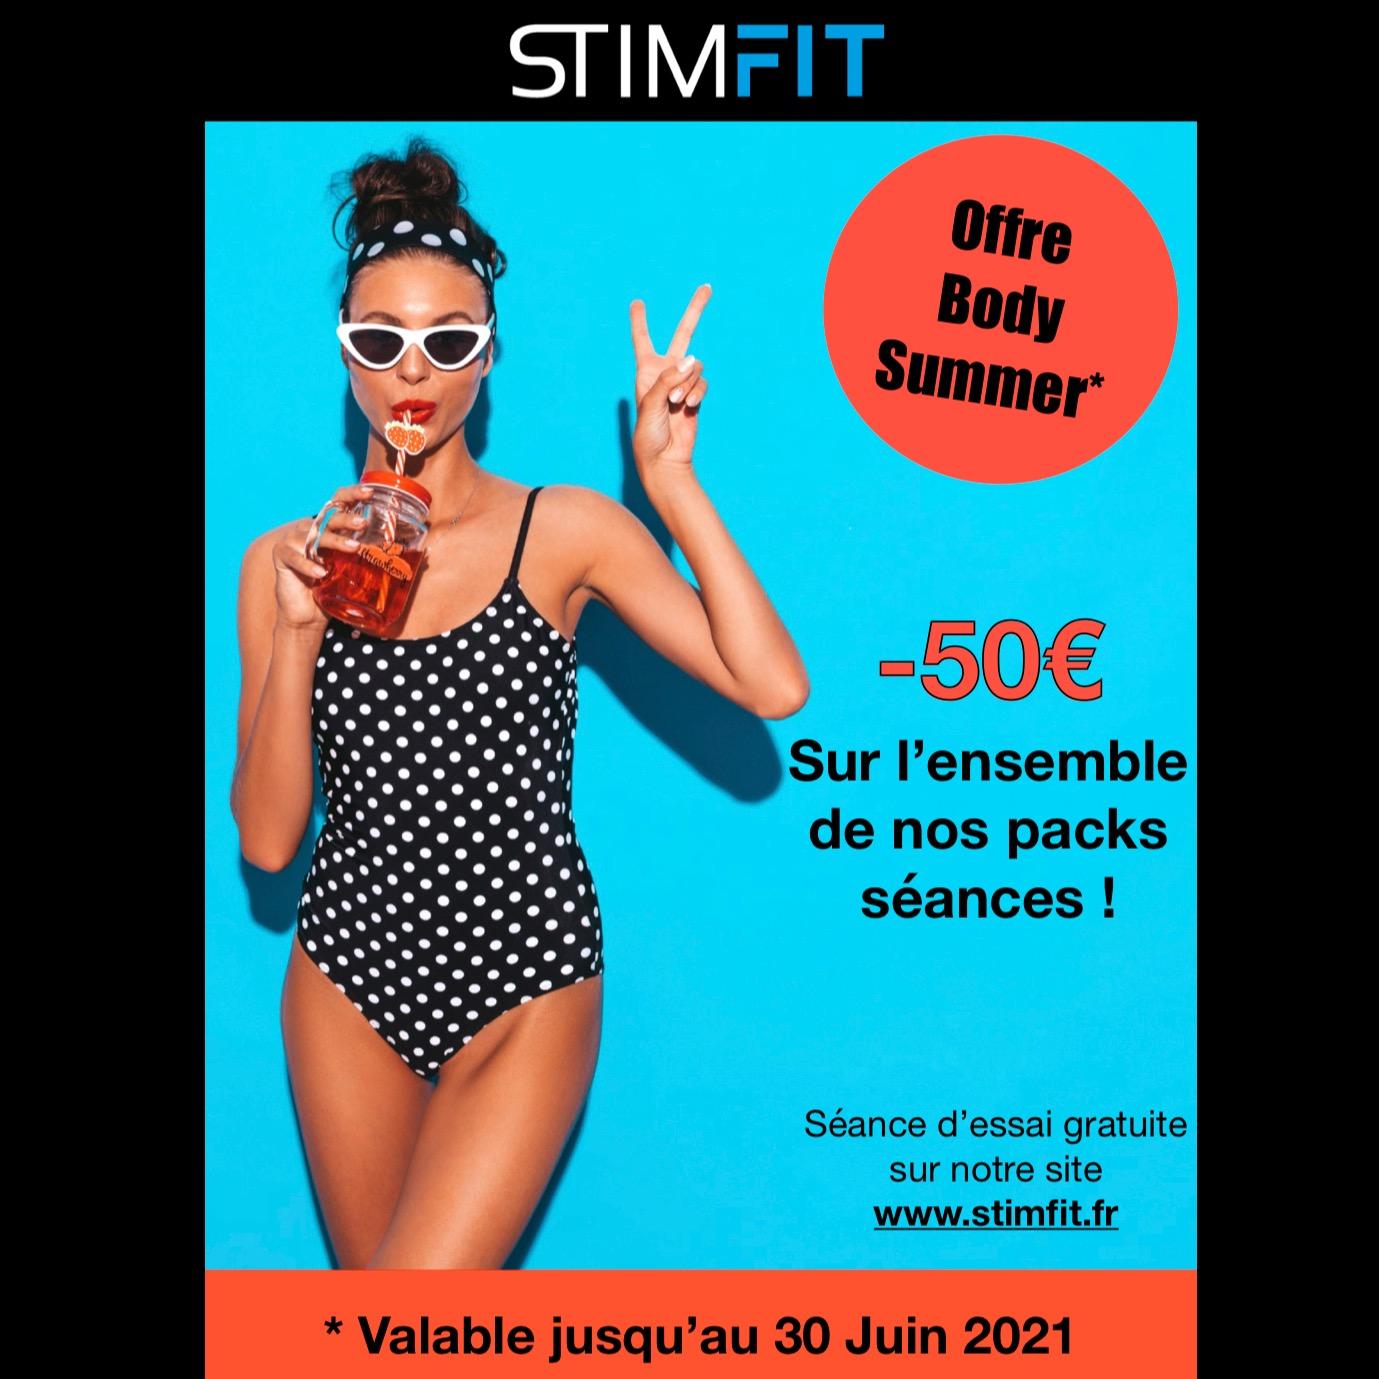 Offre Body Summer